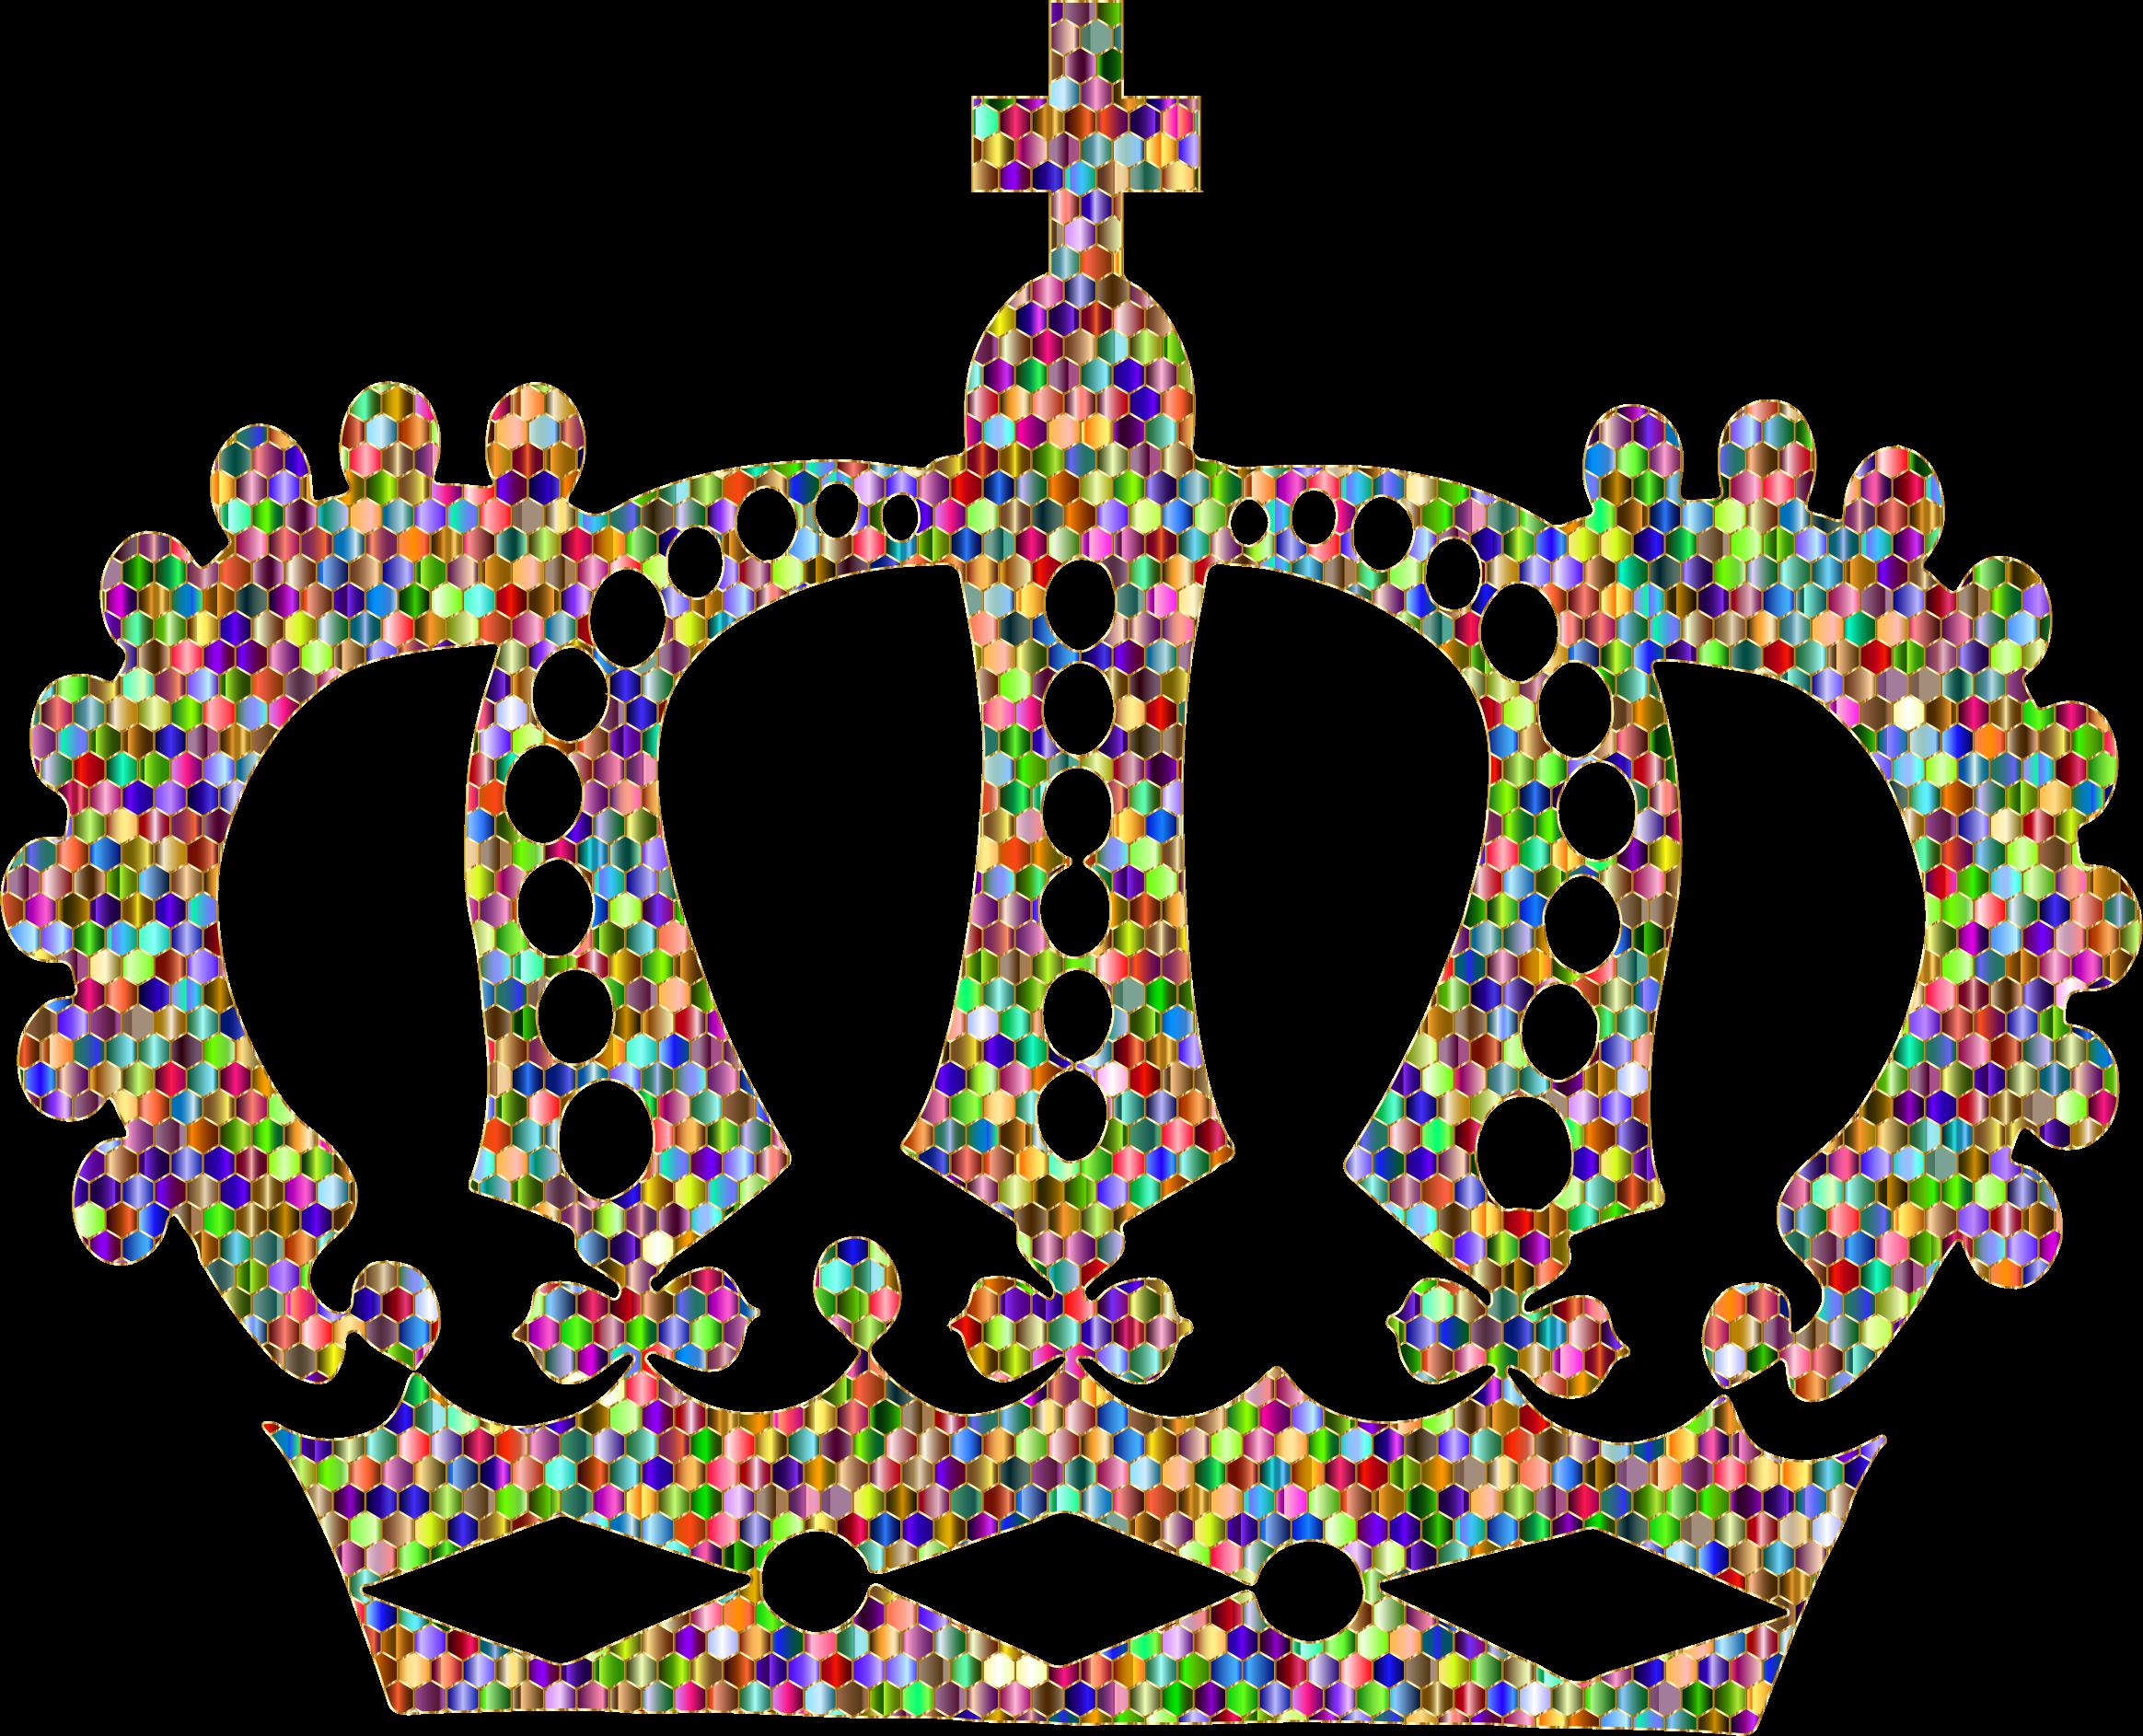 2328x1886 Crown Clipart Royal Gold